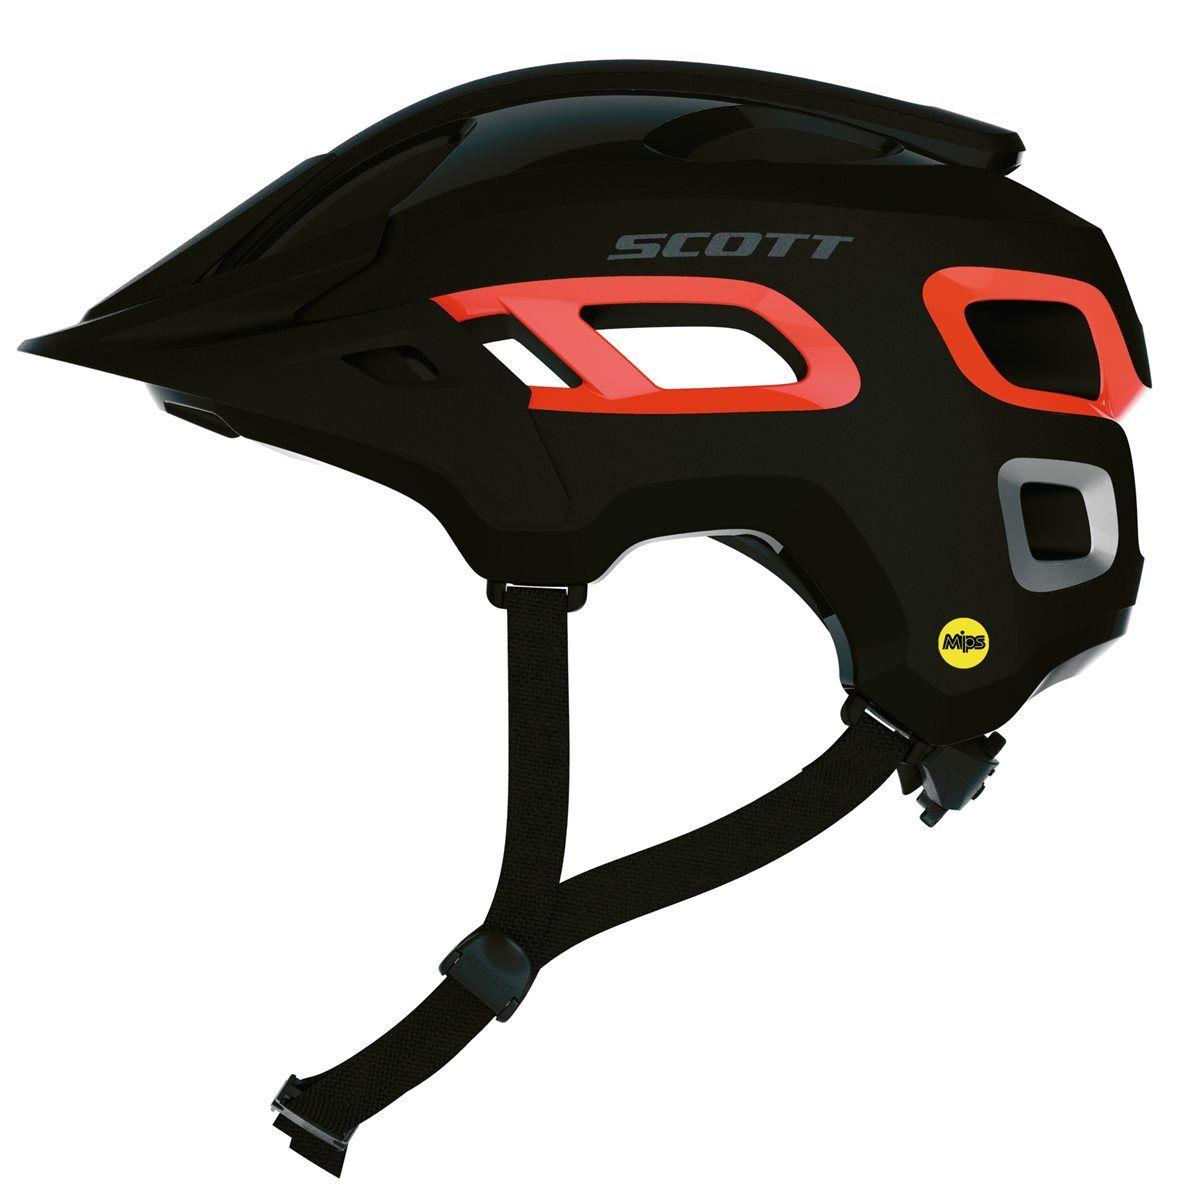 Scott Stego Mtb Cycling Helmet Cool Bike Helmets Bmx Bikes Bike Helmet